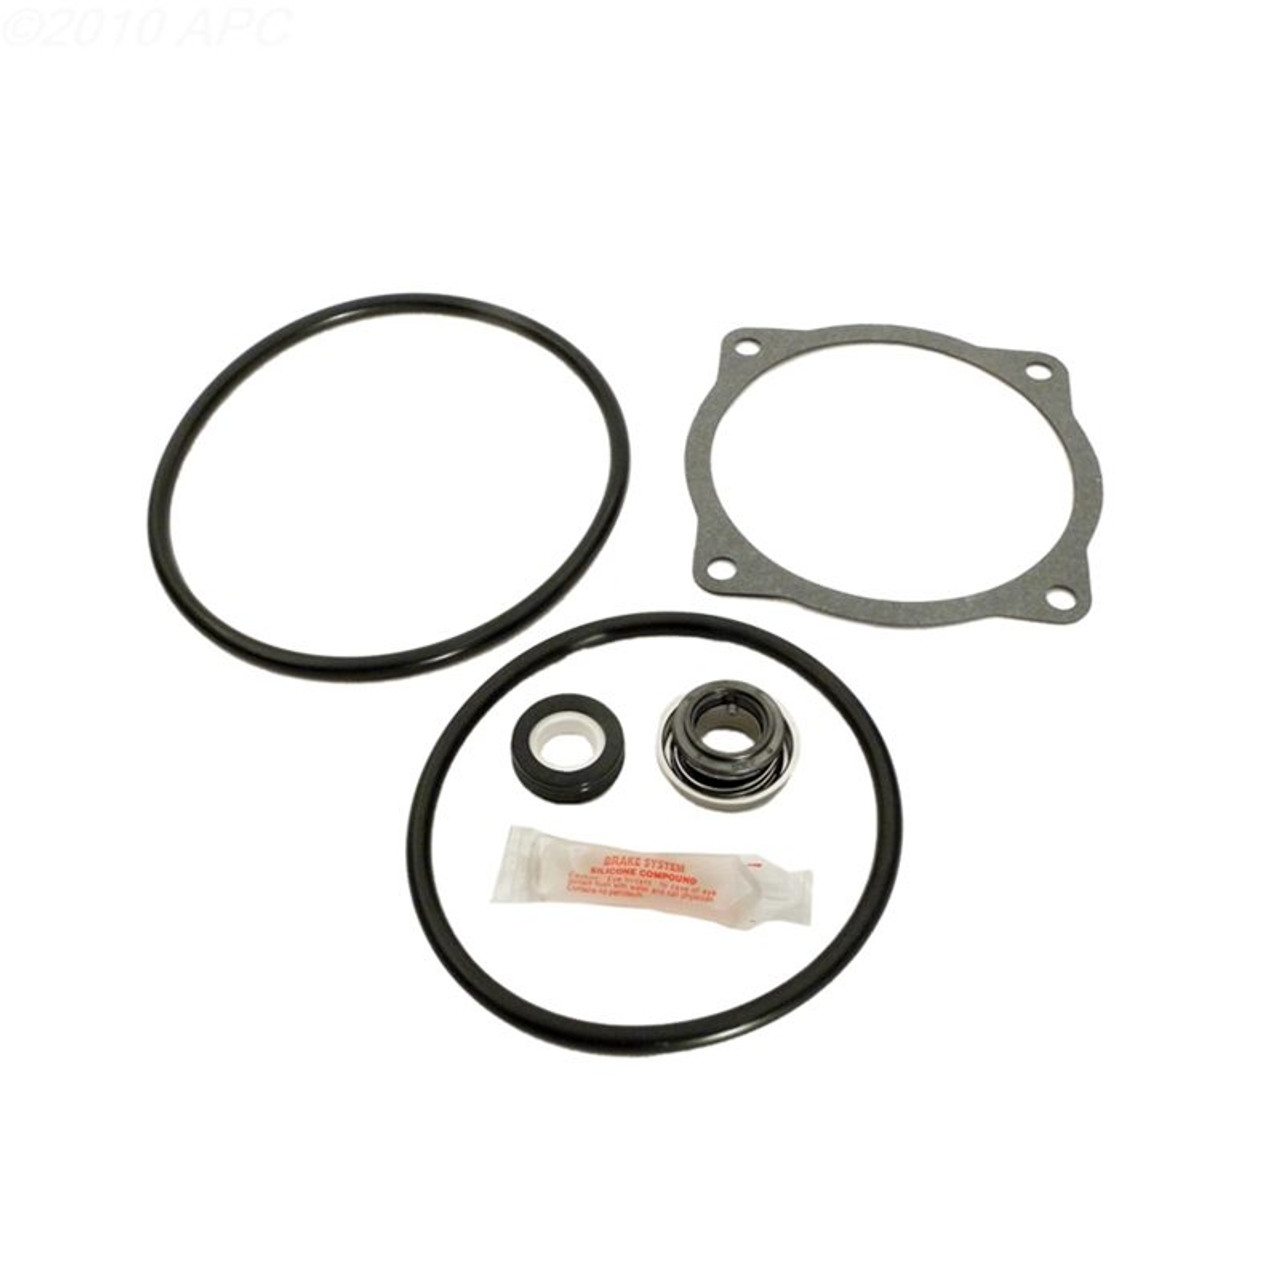 Seal and Gasket Kit - CF6